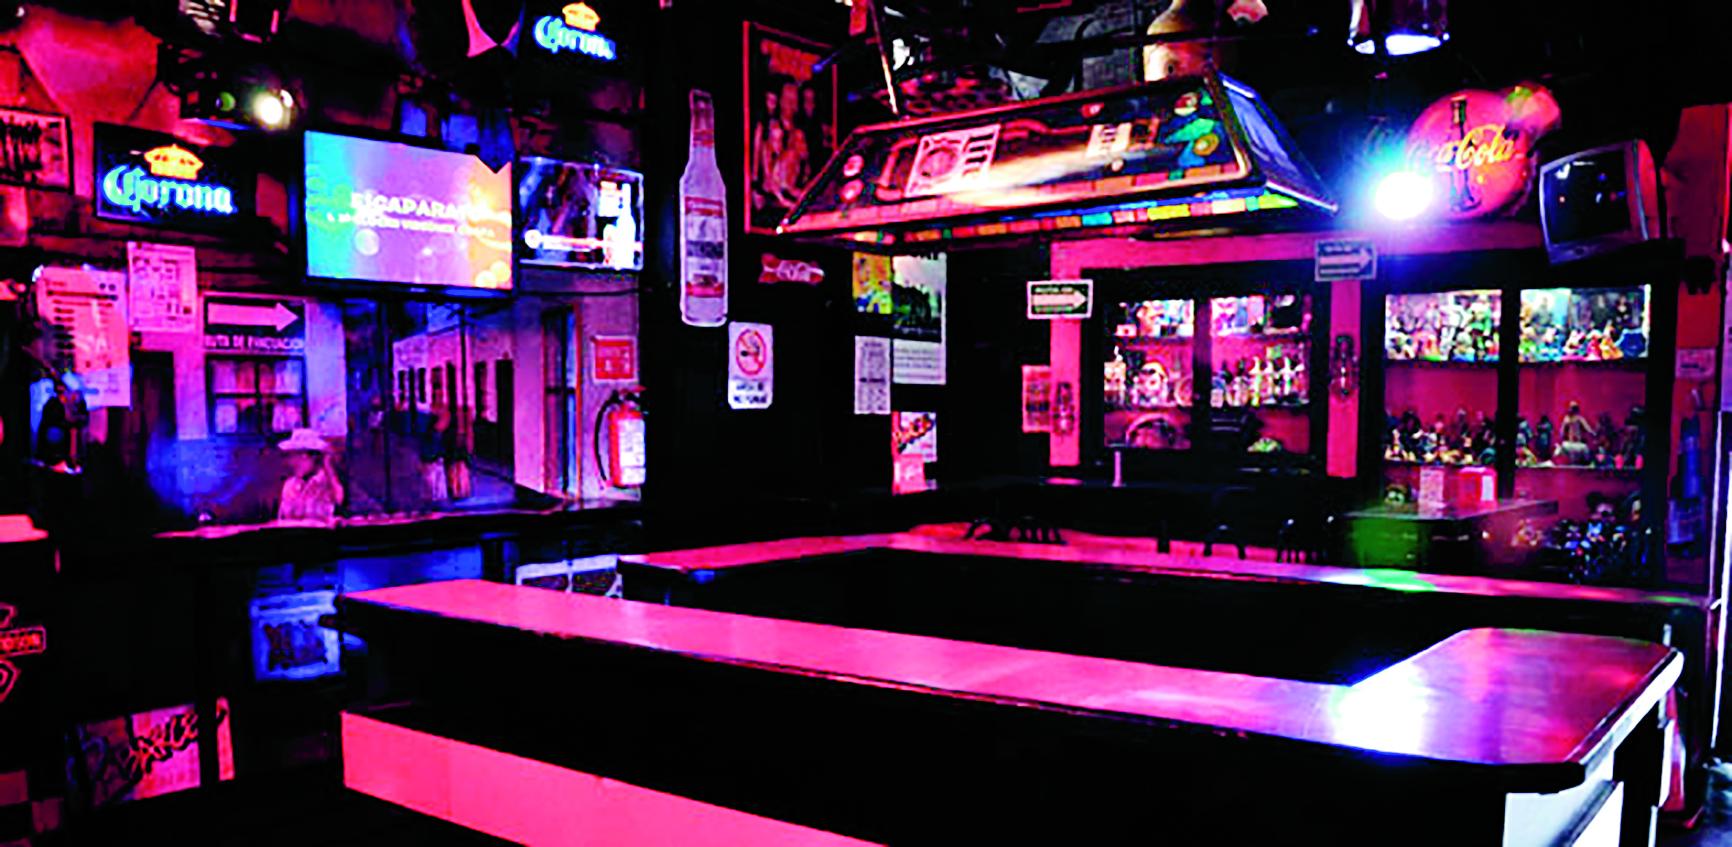 lugares para ir a cantar karaoke m225sporm225s